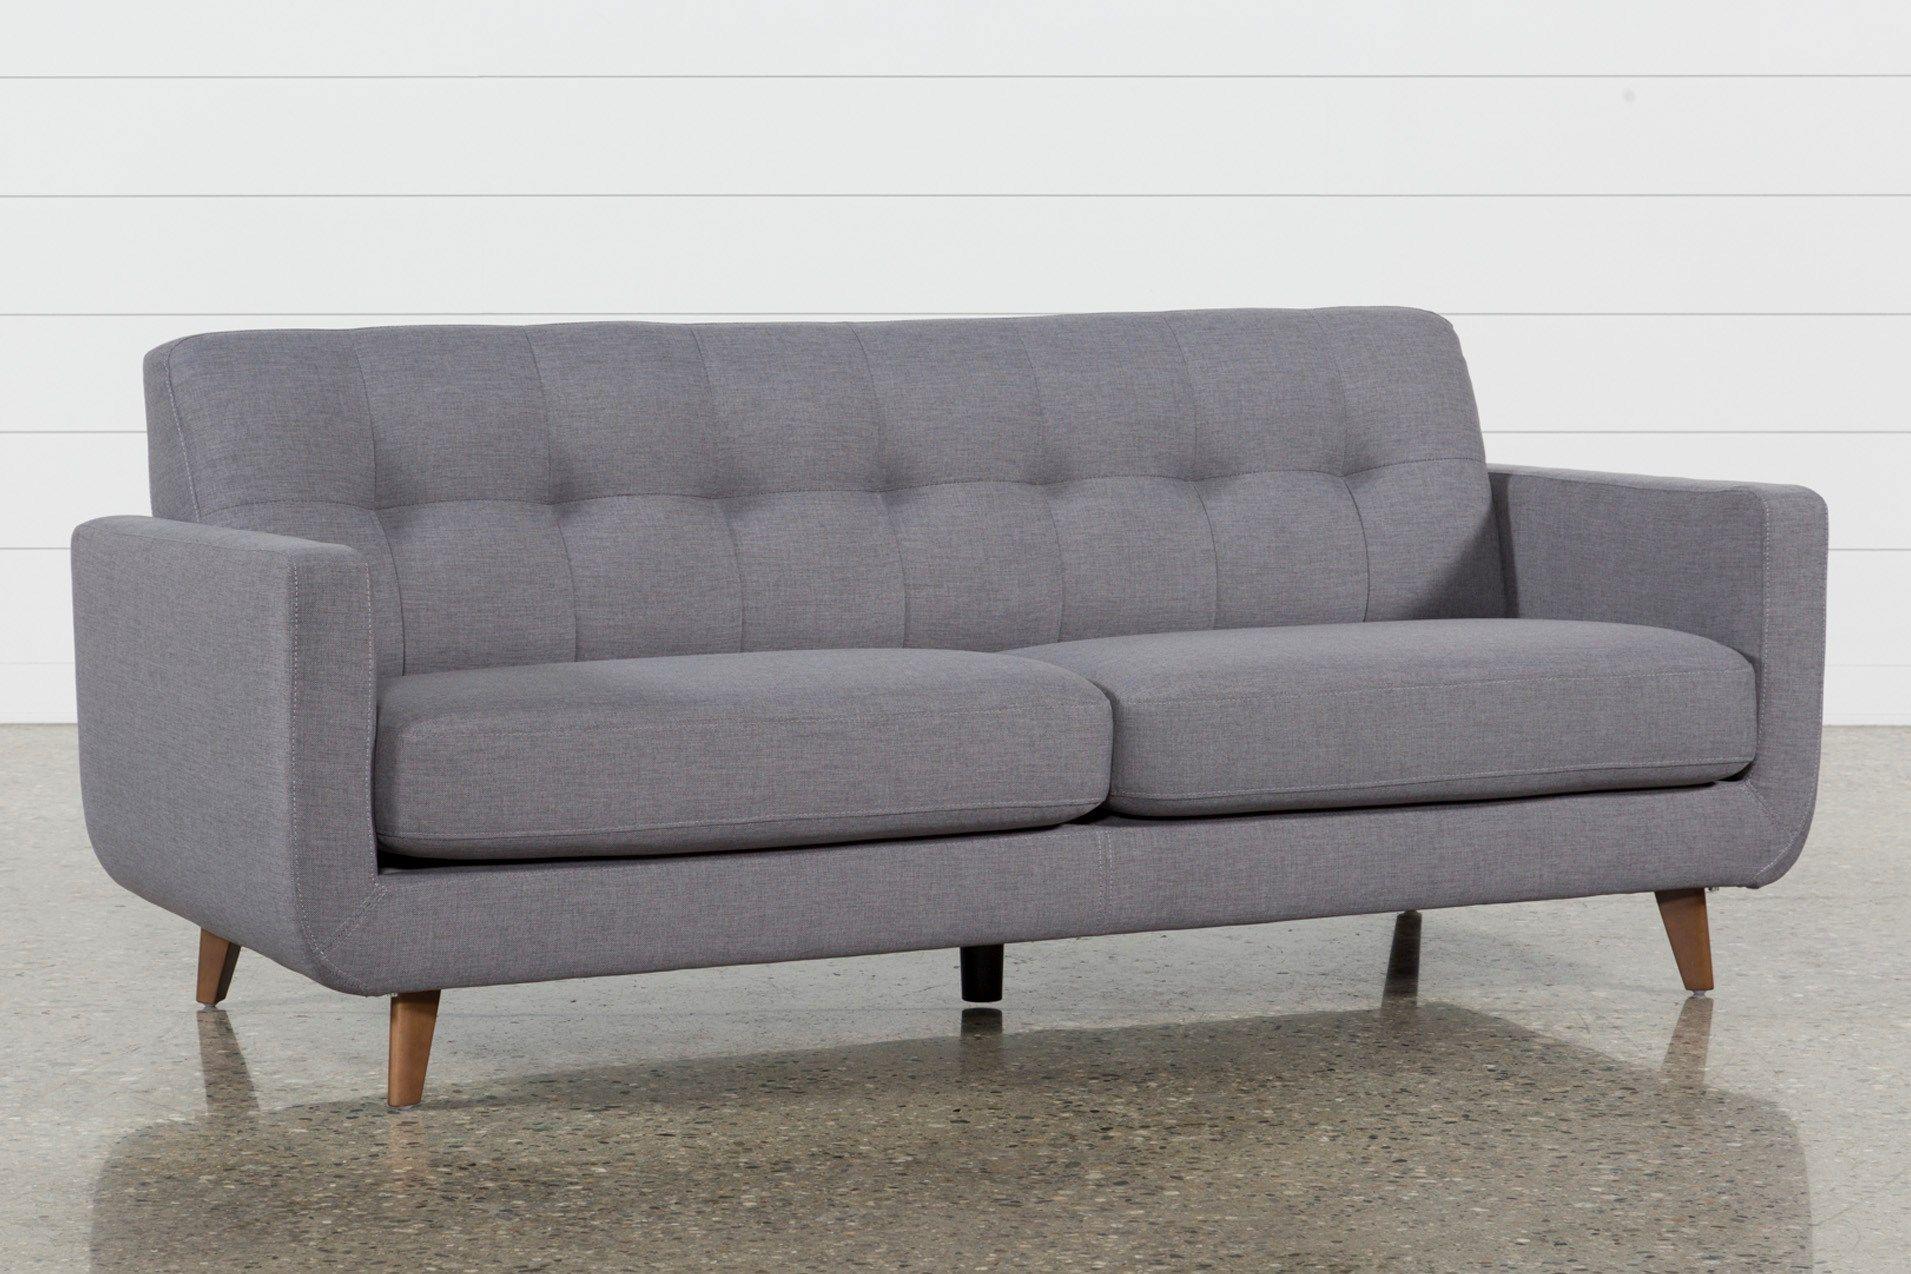 Contemporary Grey Sofa In 2020 Dark Gray Sofa Gray Sofa Living Modern Grey Sofa